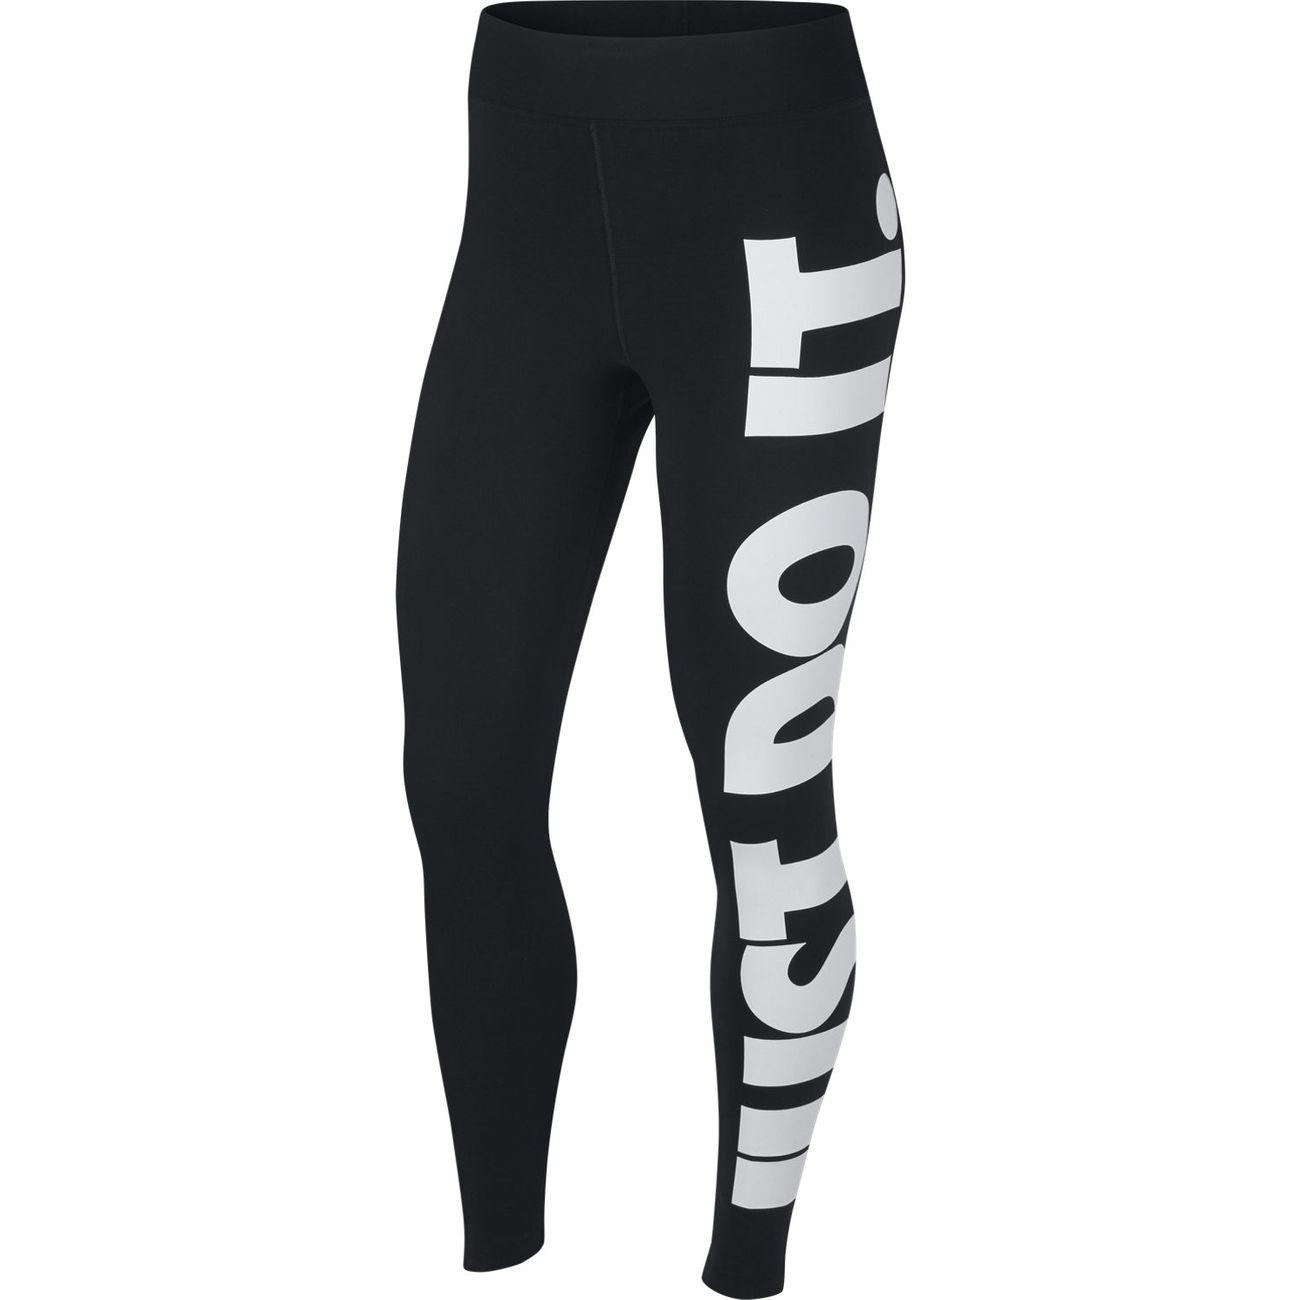 Leg Nsw Femme Collants ModeLifestyle Nike A See BQrdoxCeW